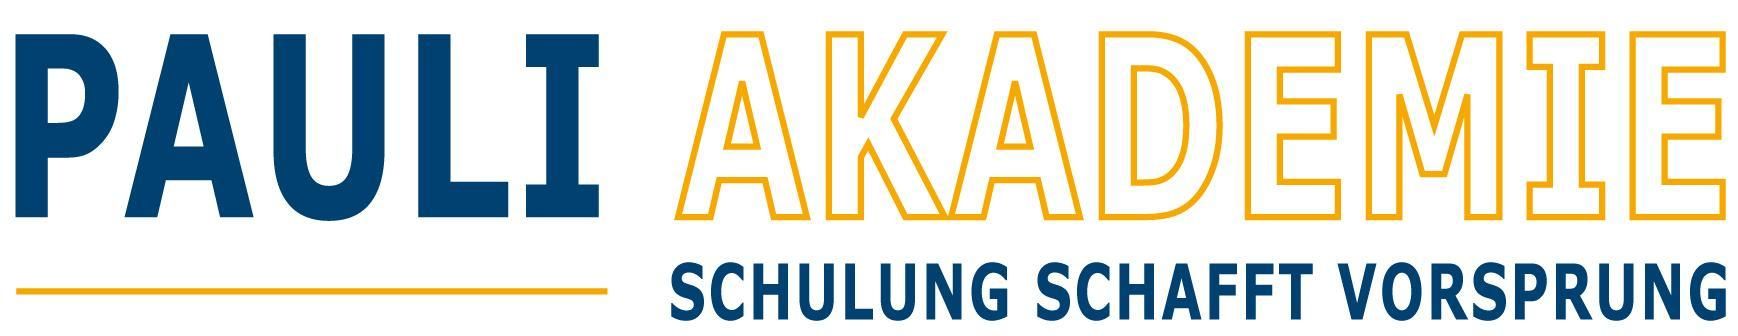 Pauli Akademie Logo